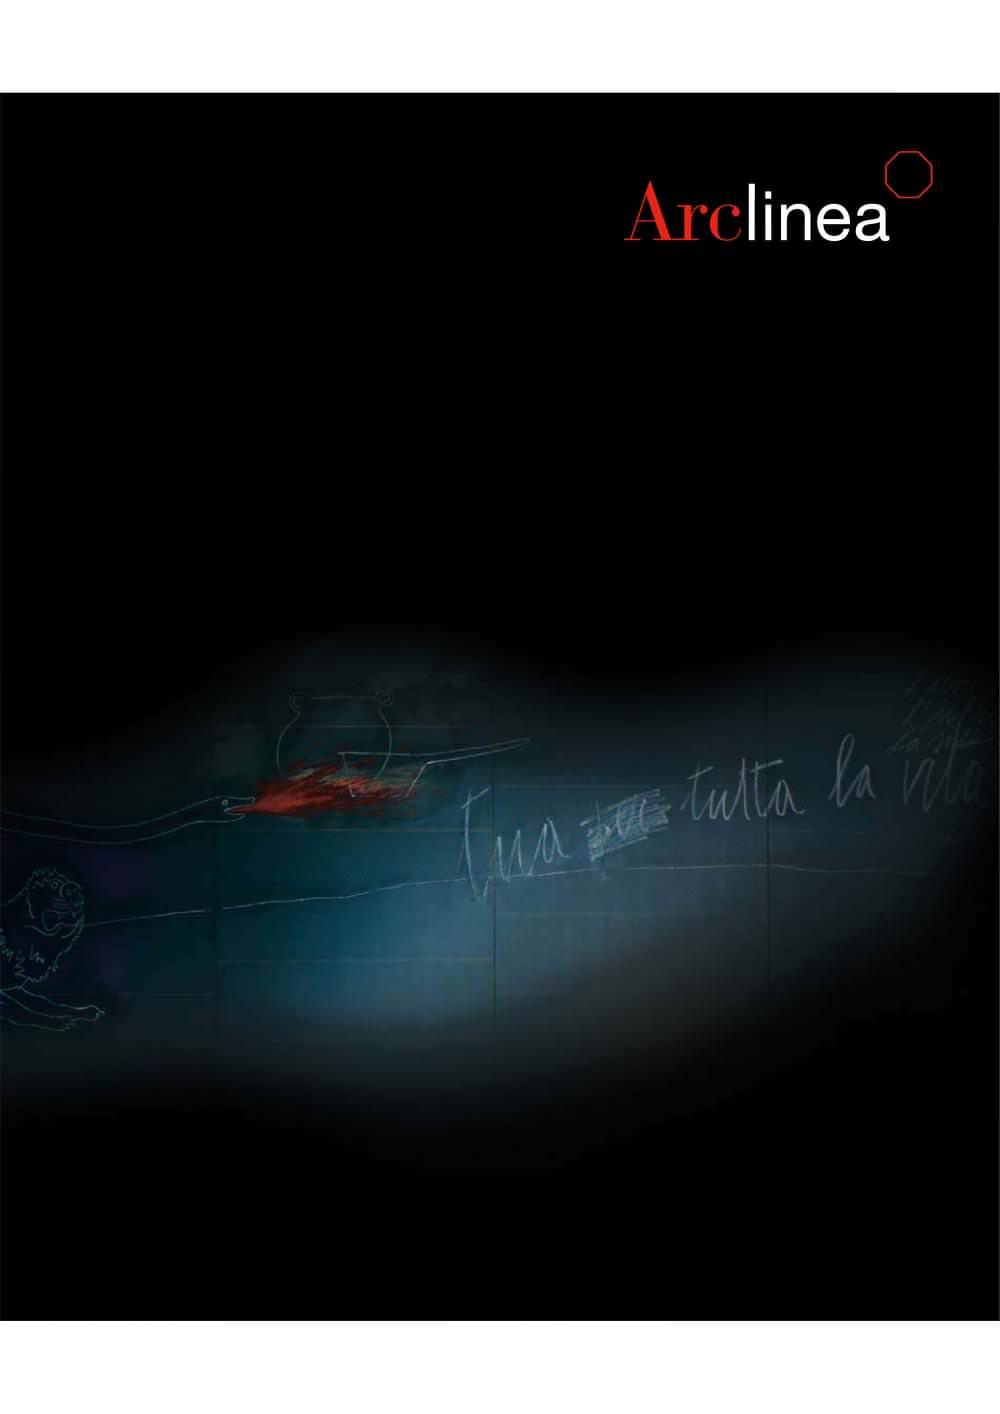 Catalogo Arclinea 2007/2008 - Arclinea - Catalogo PDF ...